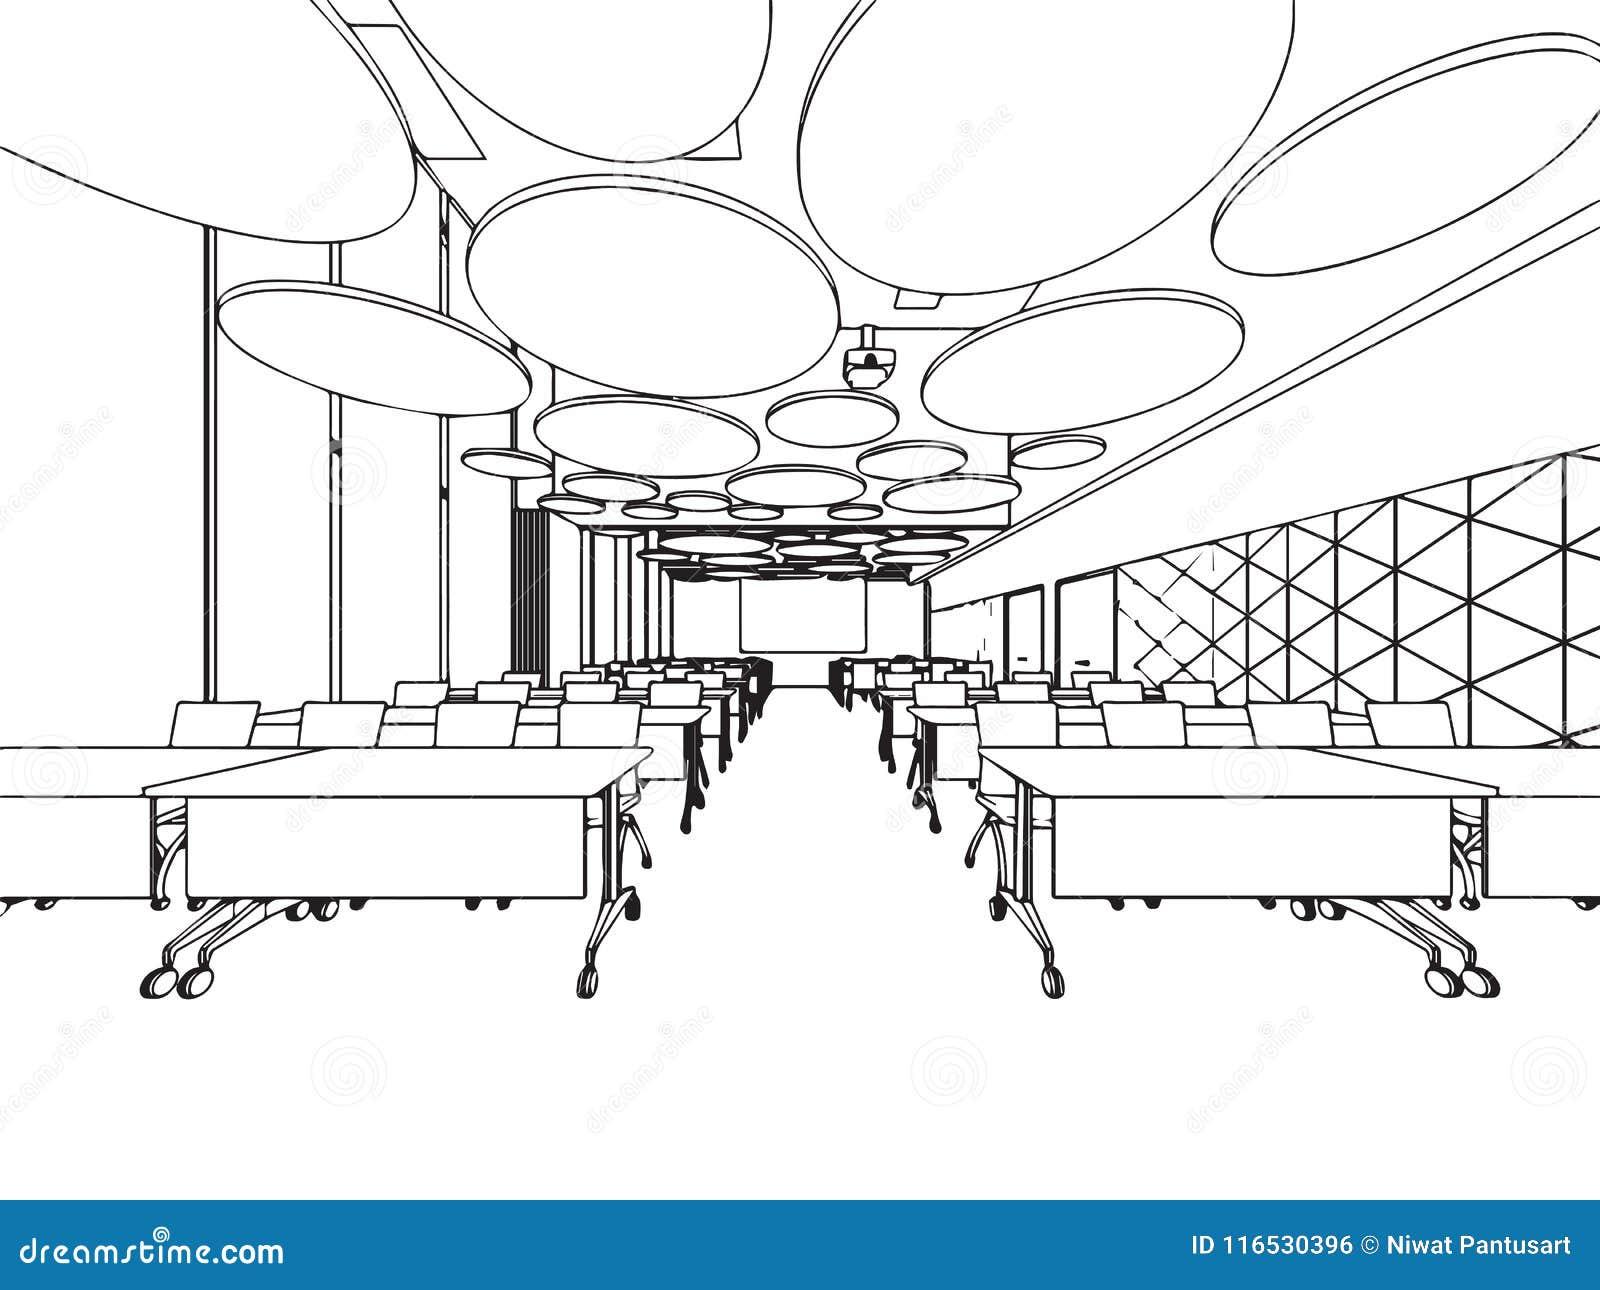 Oficina Interior De La Perspectiva Del Dibujo De Bosquejo Del